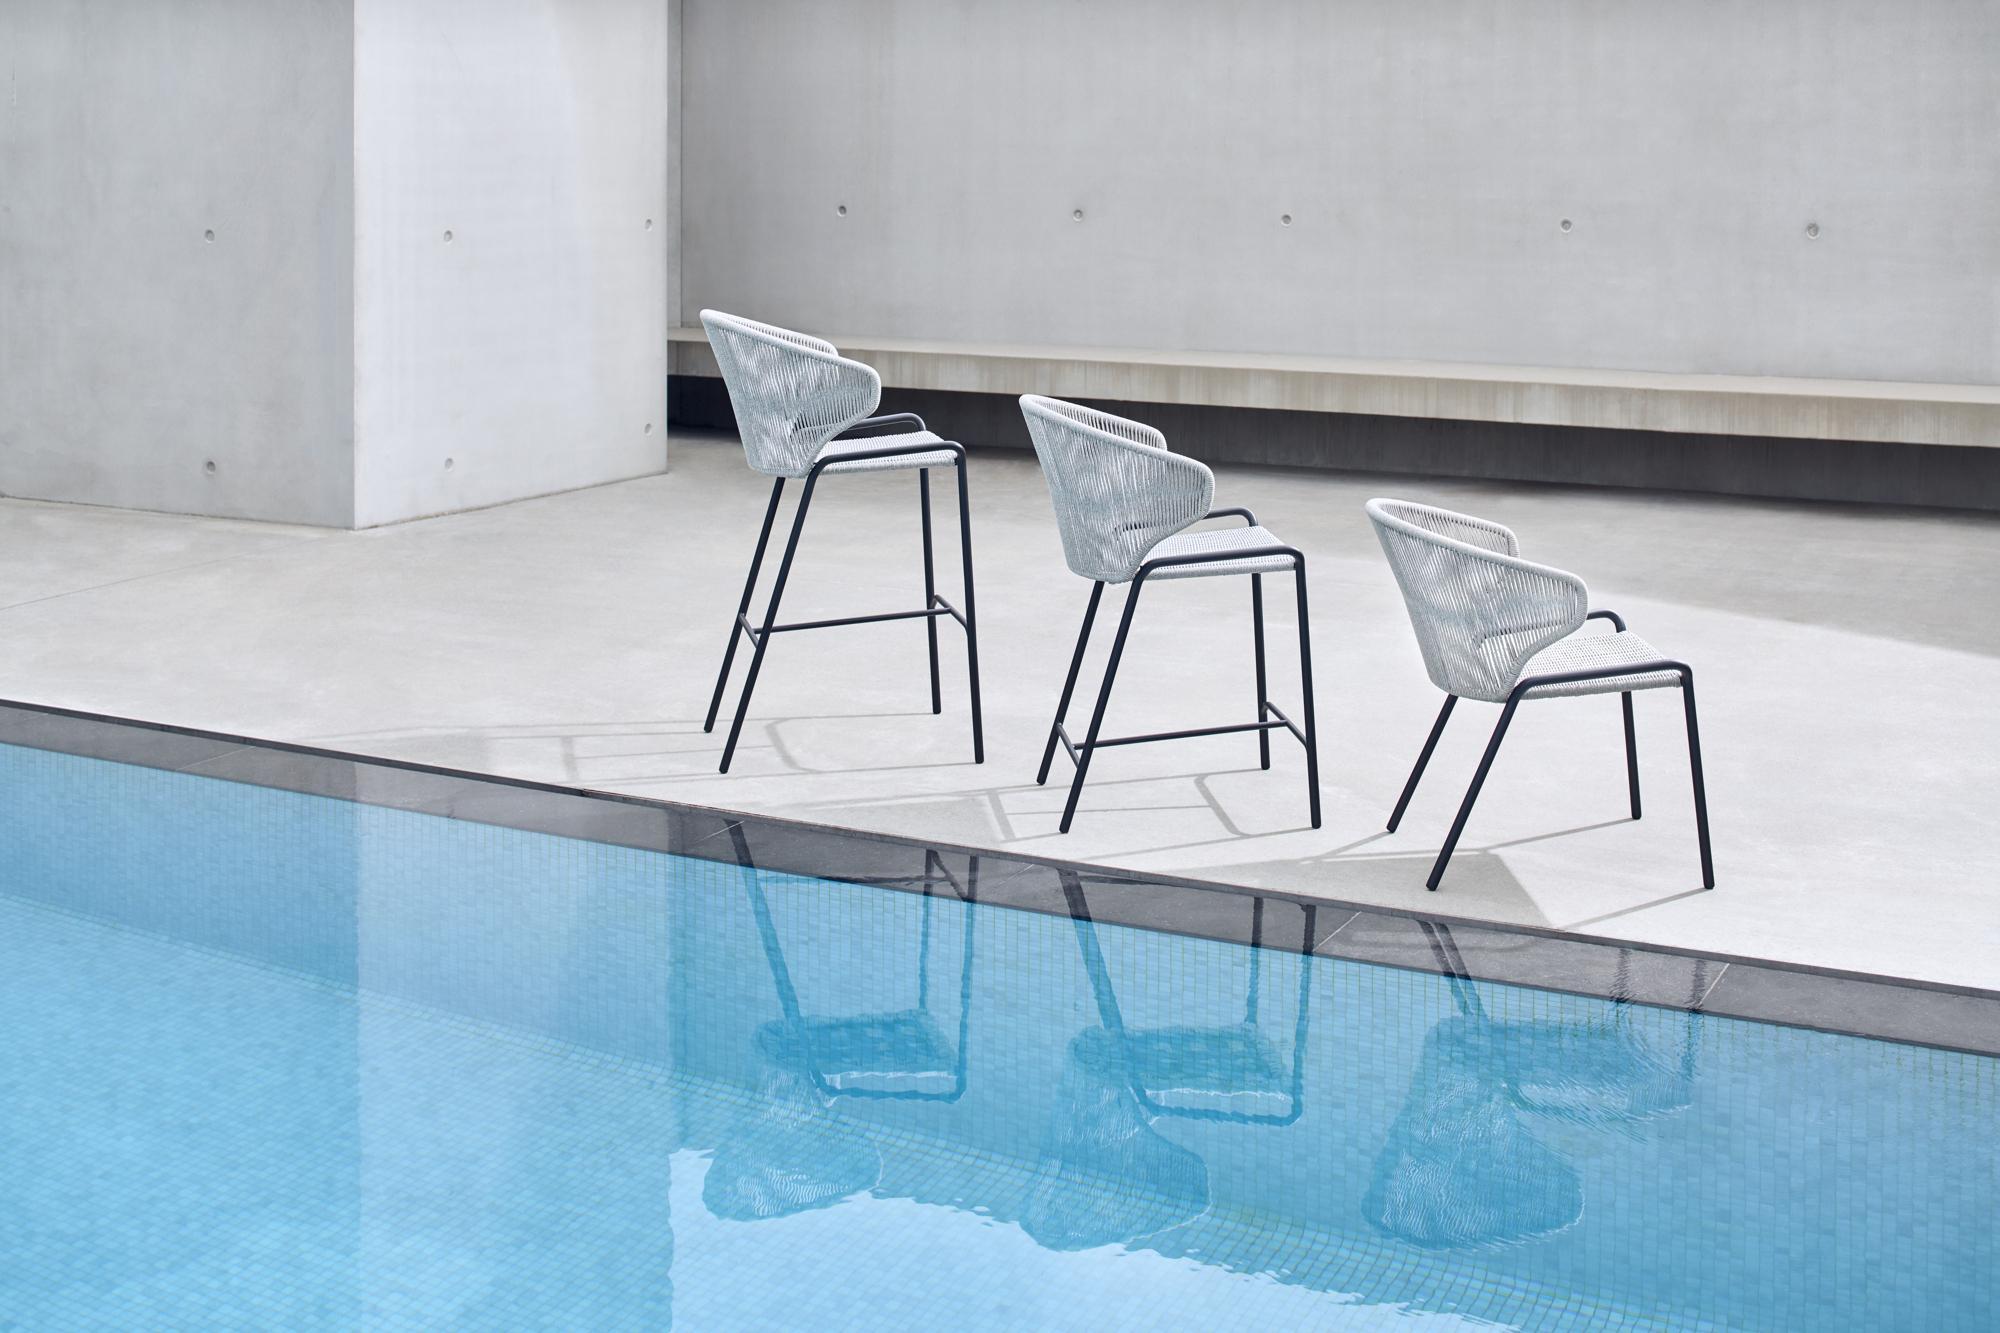 Radius chaises